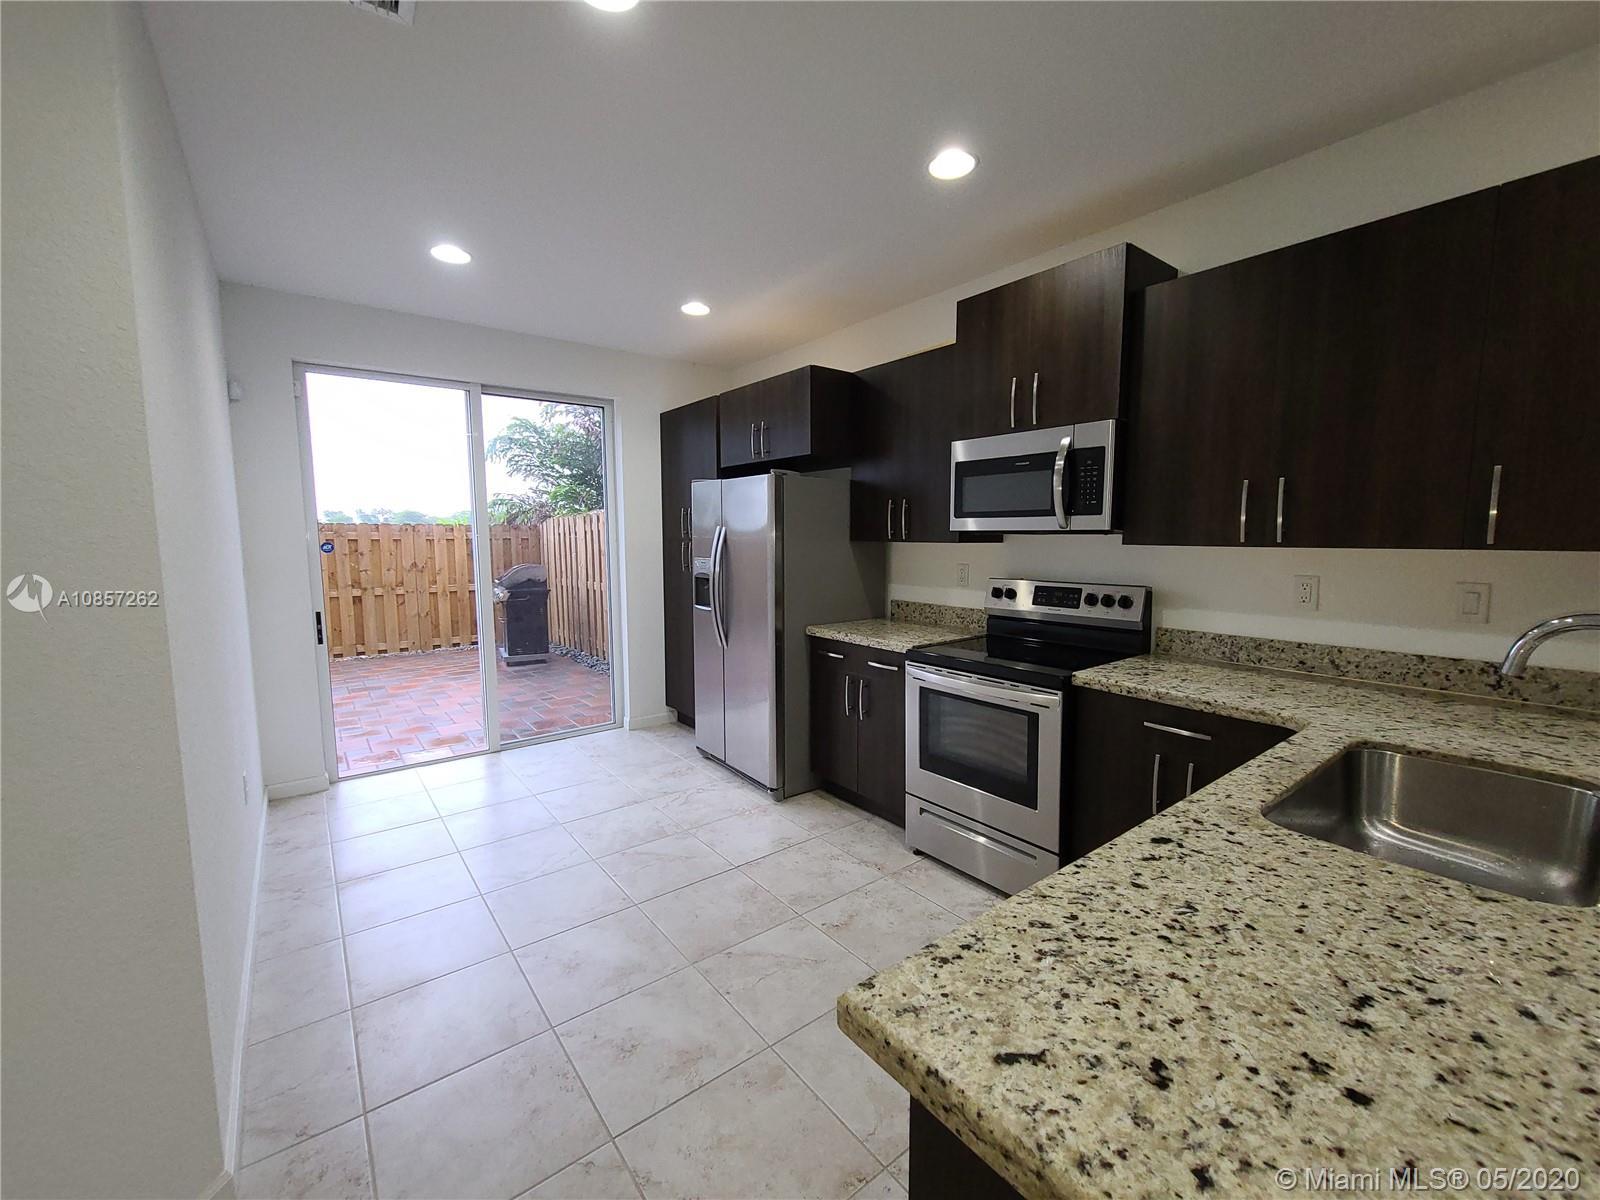 1429 SE 26th Ave #1429, Homestead, FL 33035 - Homestead, FL real estate listing